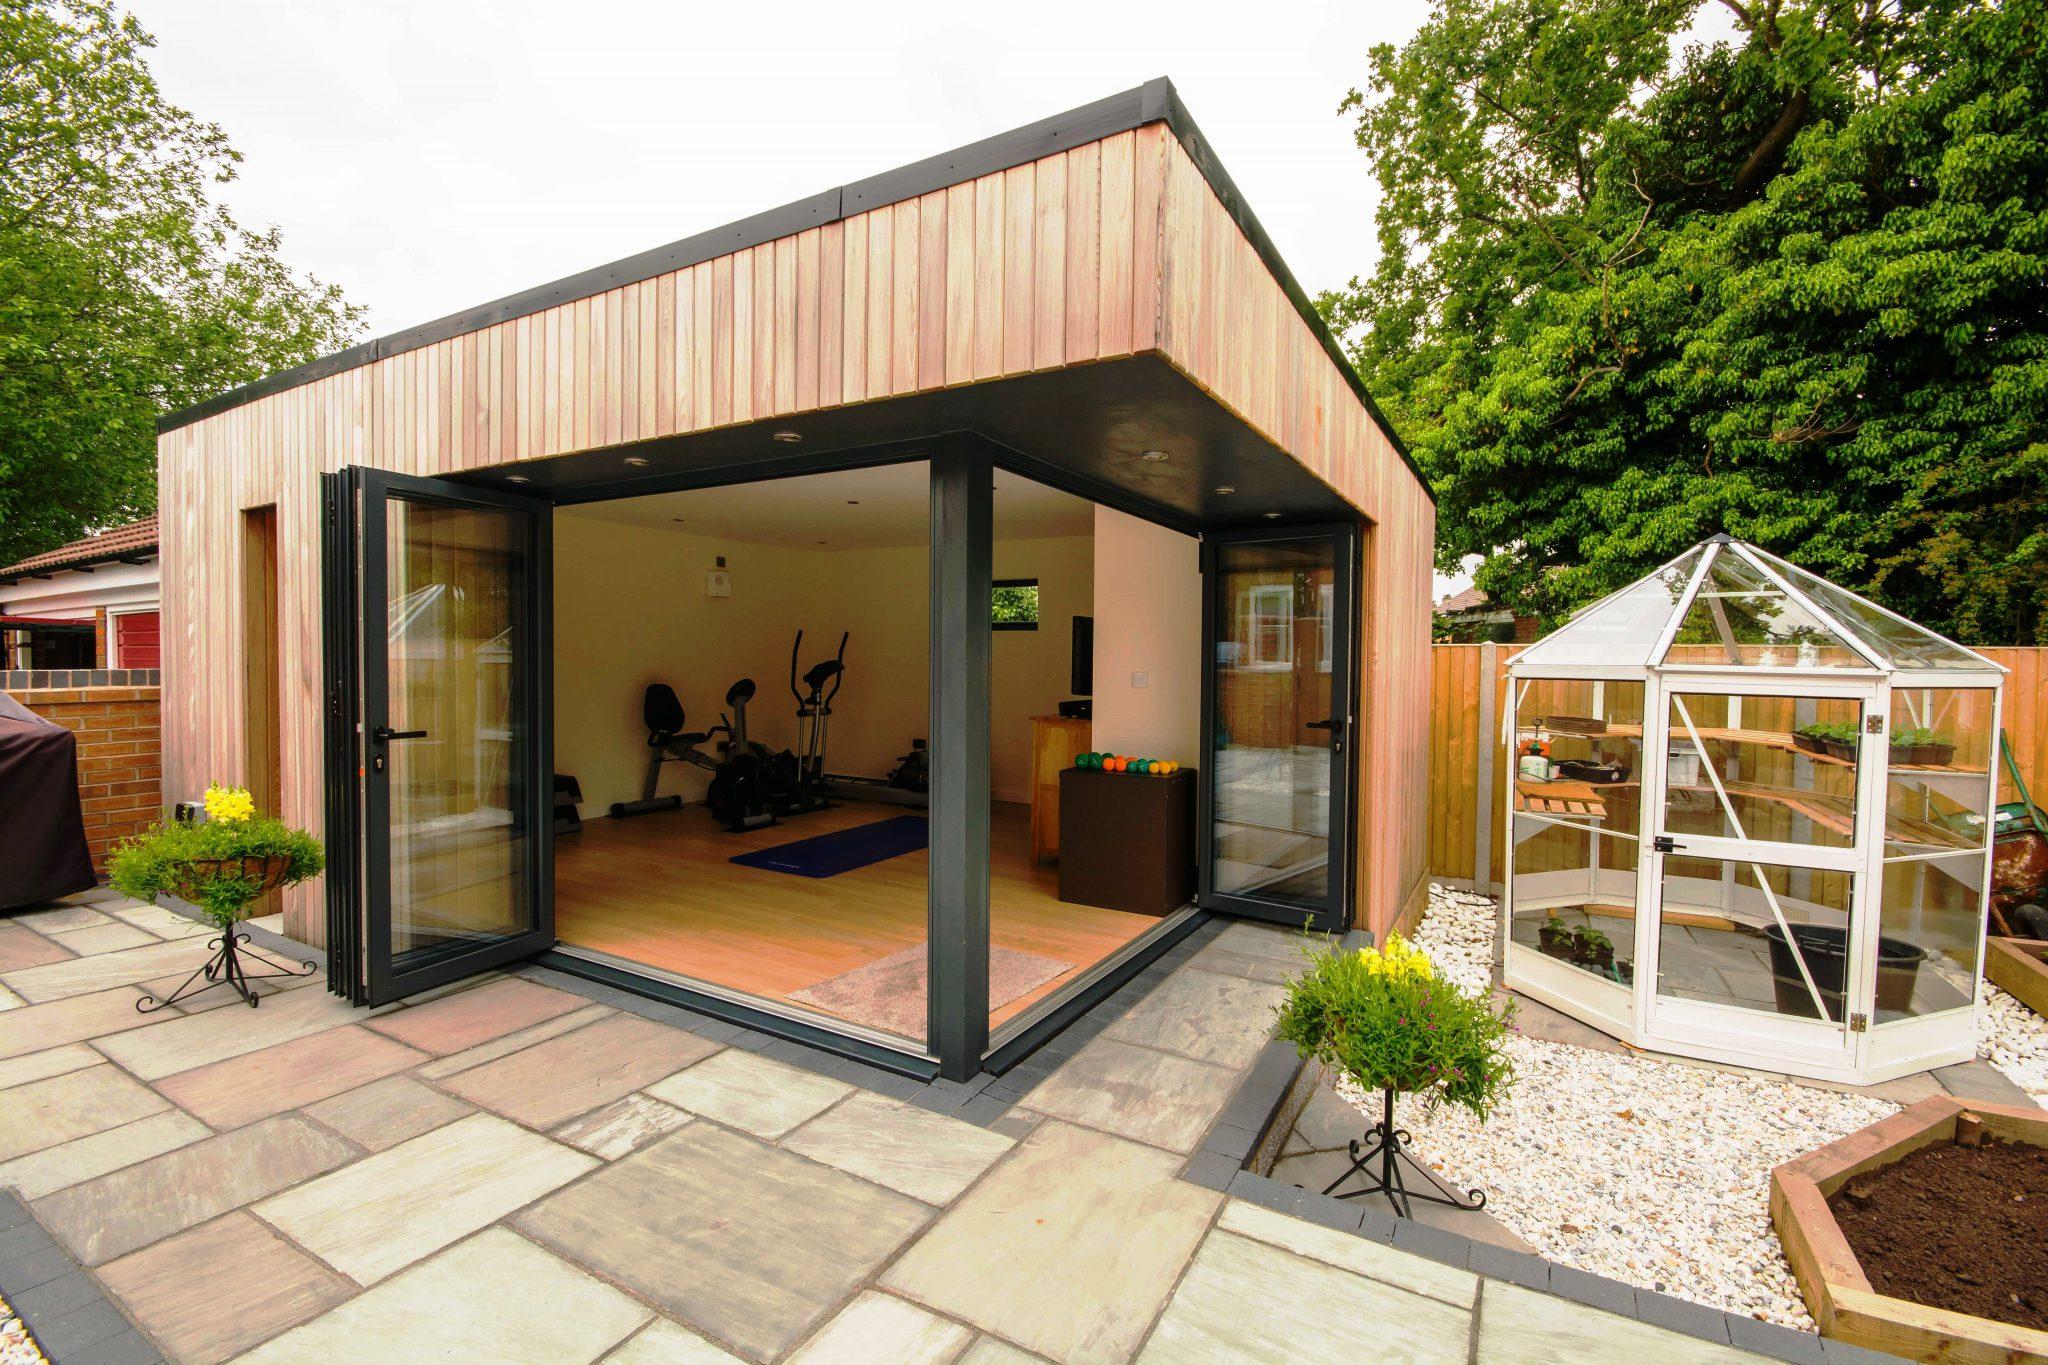 Swift garden rooms garden rooms studios and offices in for Garden rooms cheshire